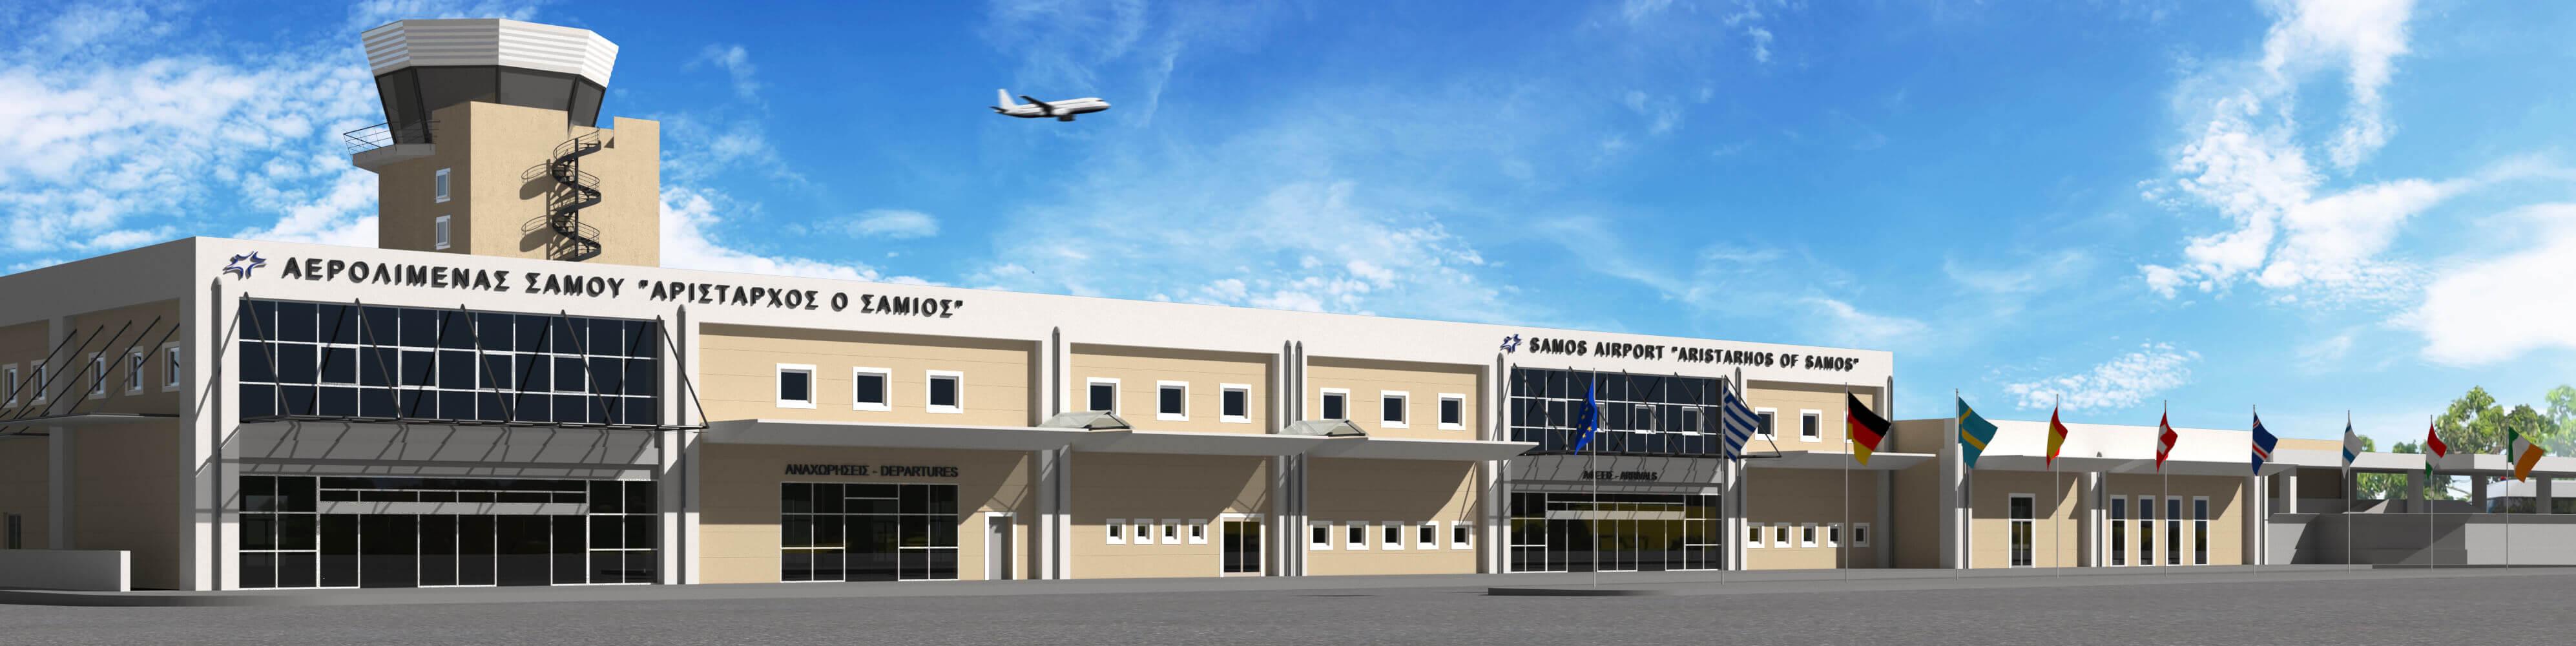 samos_airport